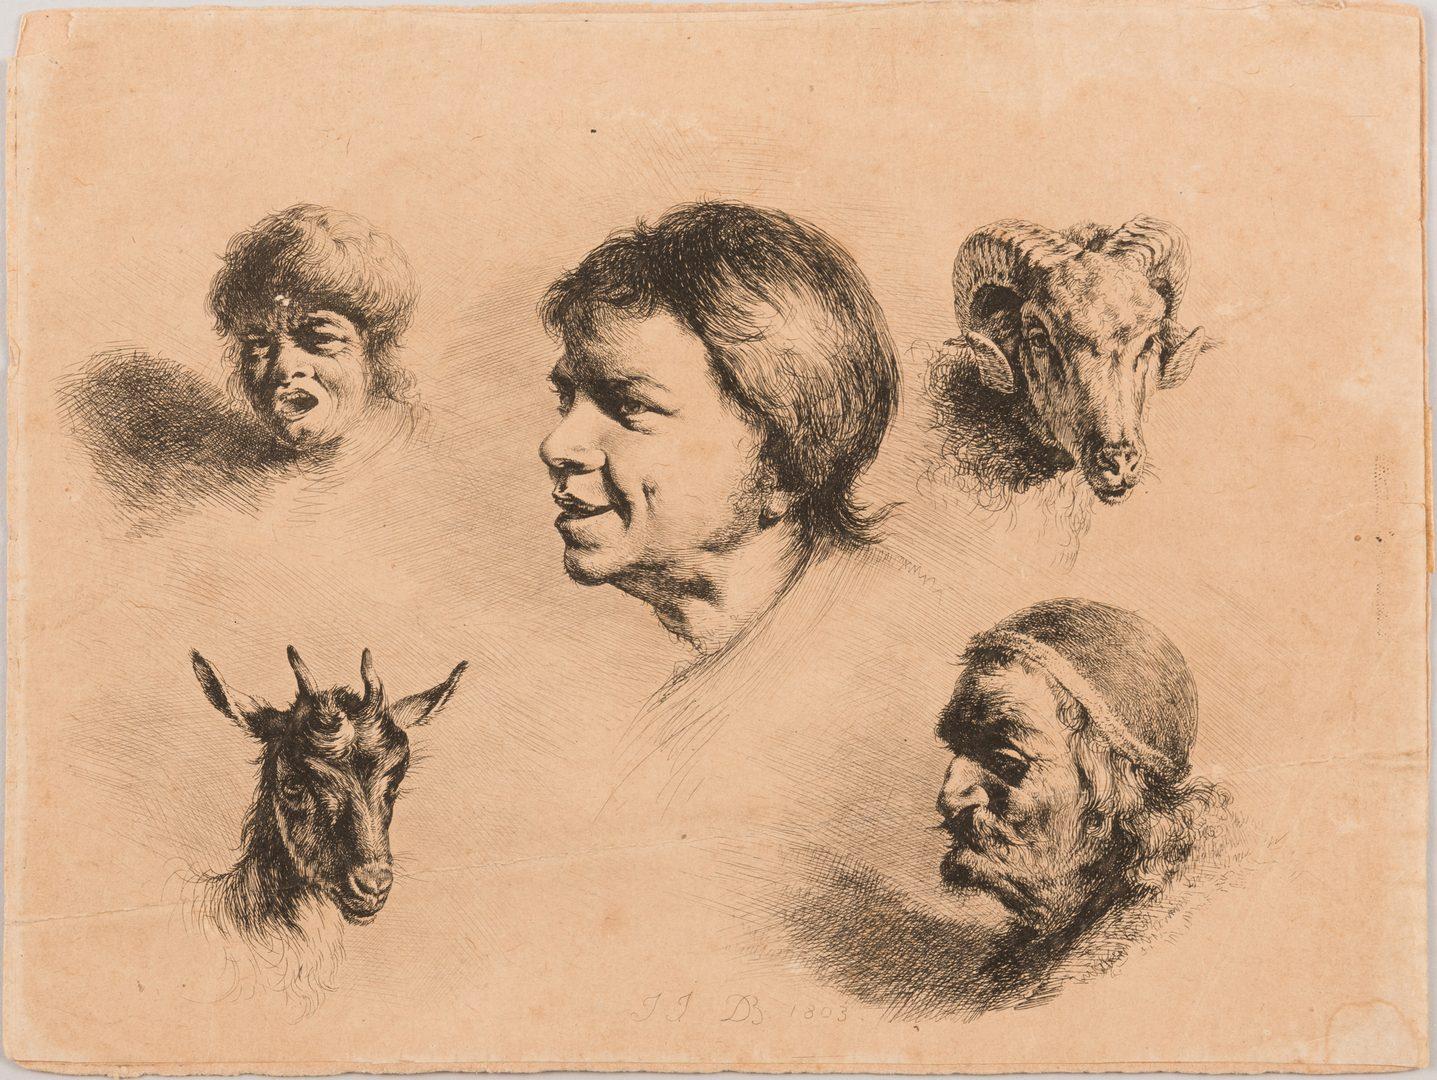 Lot 745: 5 Works on Paper, inc. Hogarth, Boissieu